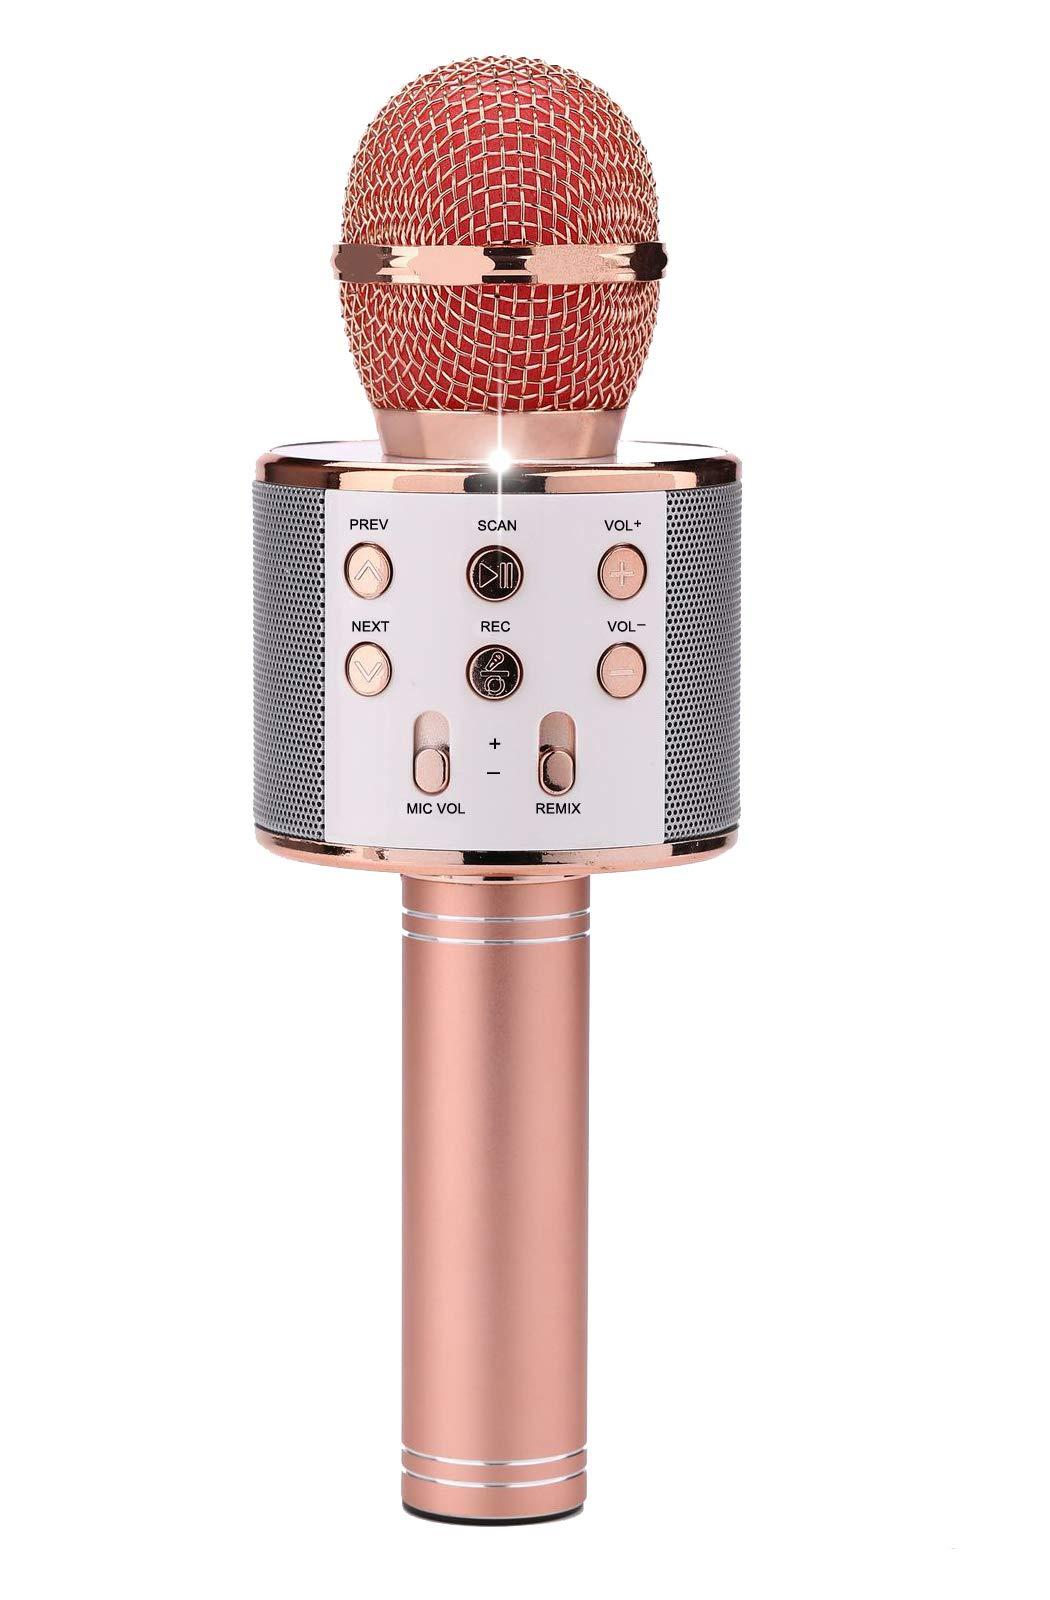 Magic Sound & FM Wireless Bluetooth Karaoke Microphone 3-in-1 Portable Speaker Machine (Rose Golden) by Natasa